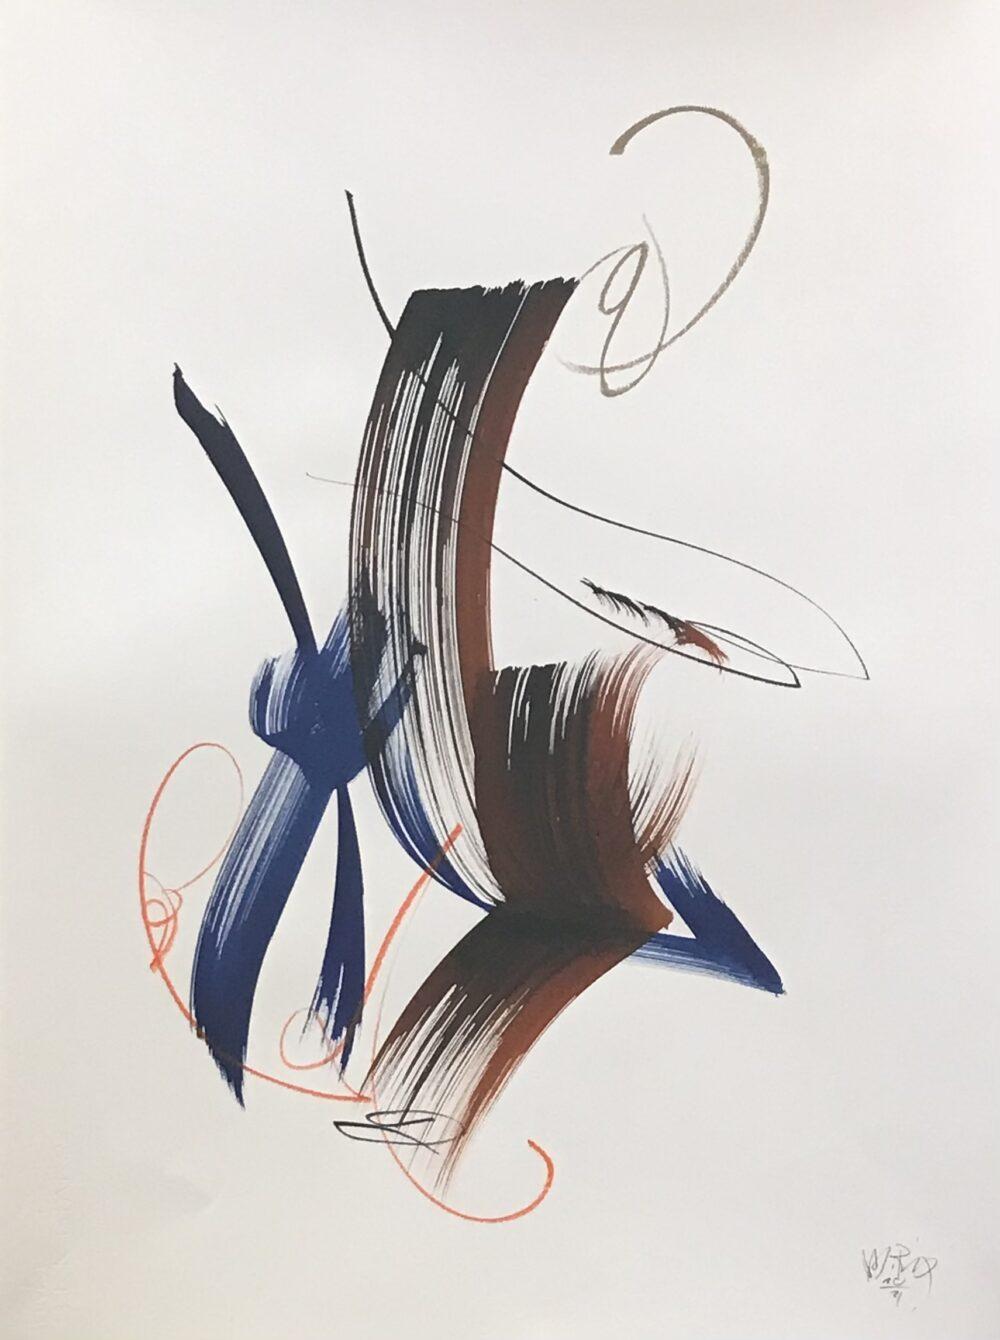 Mette Rix - Papir arbejder